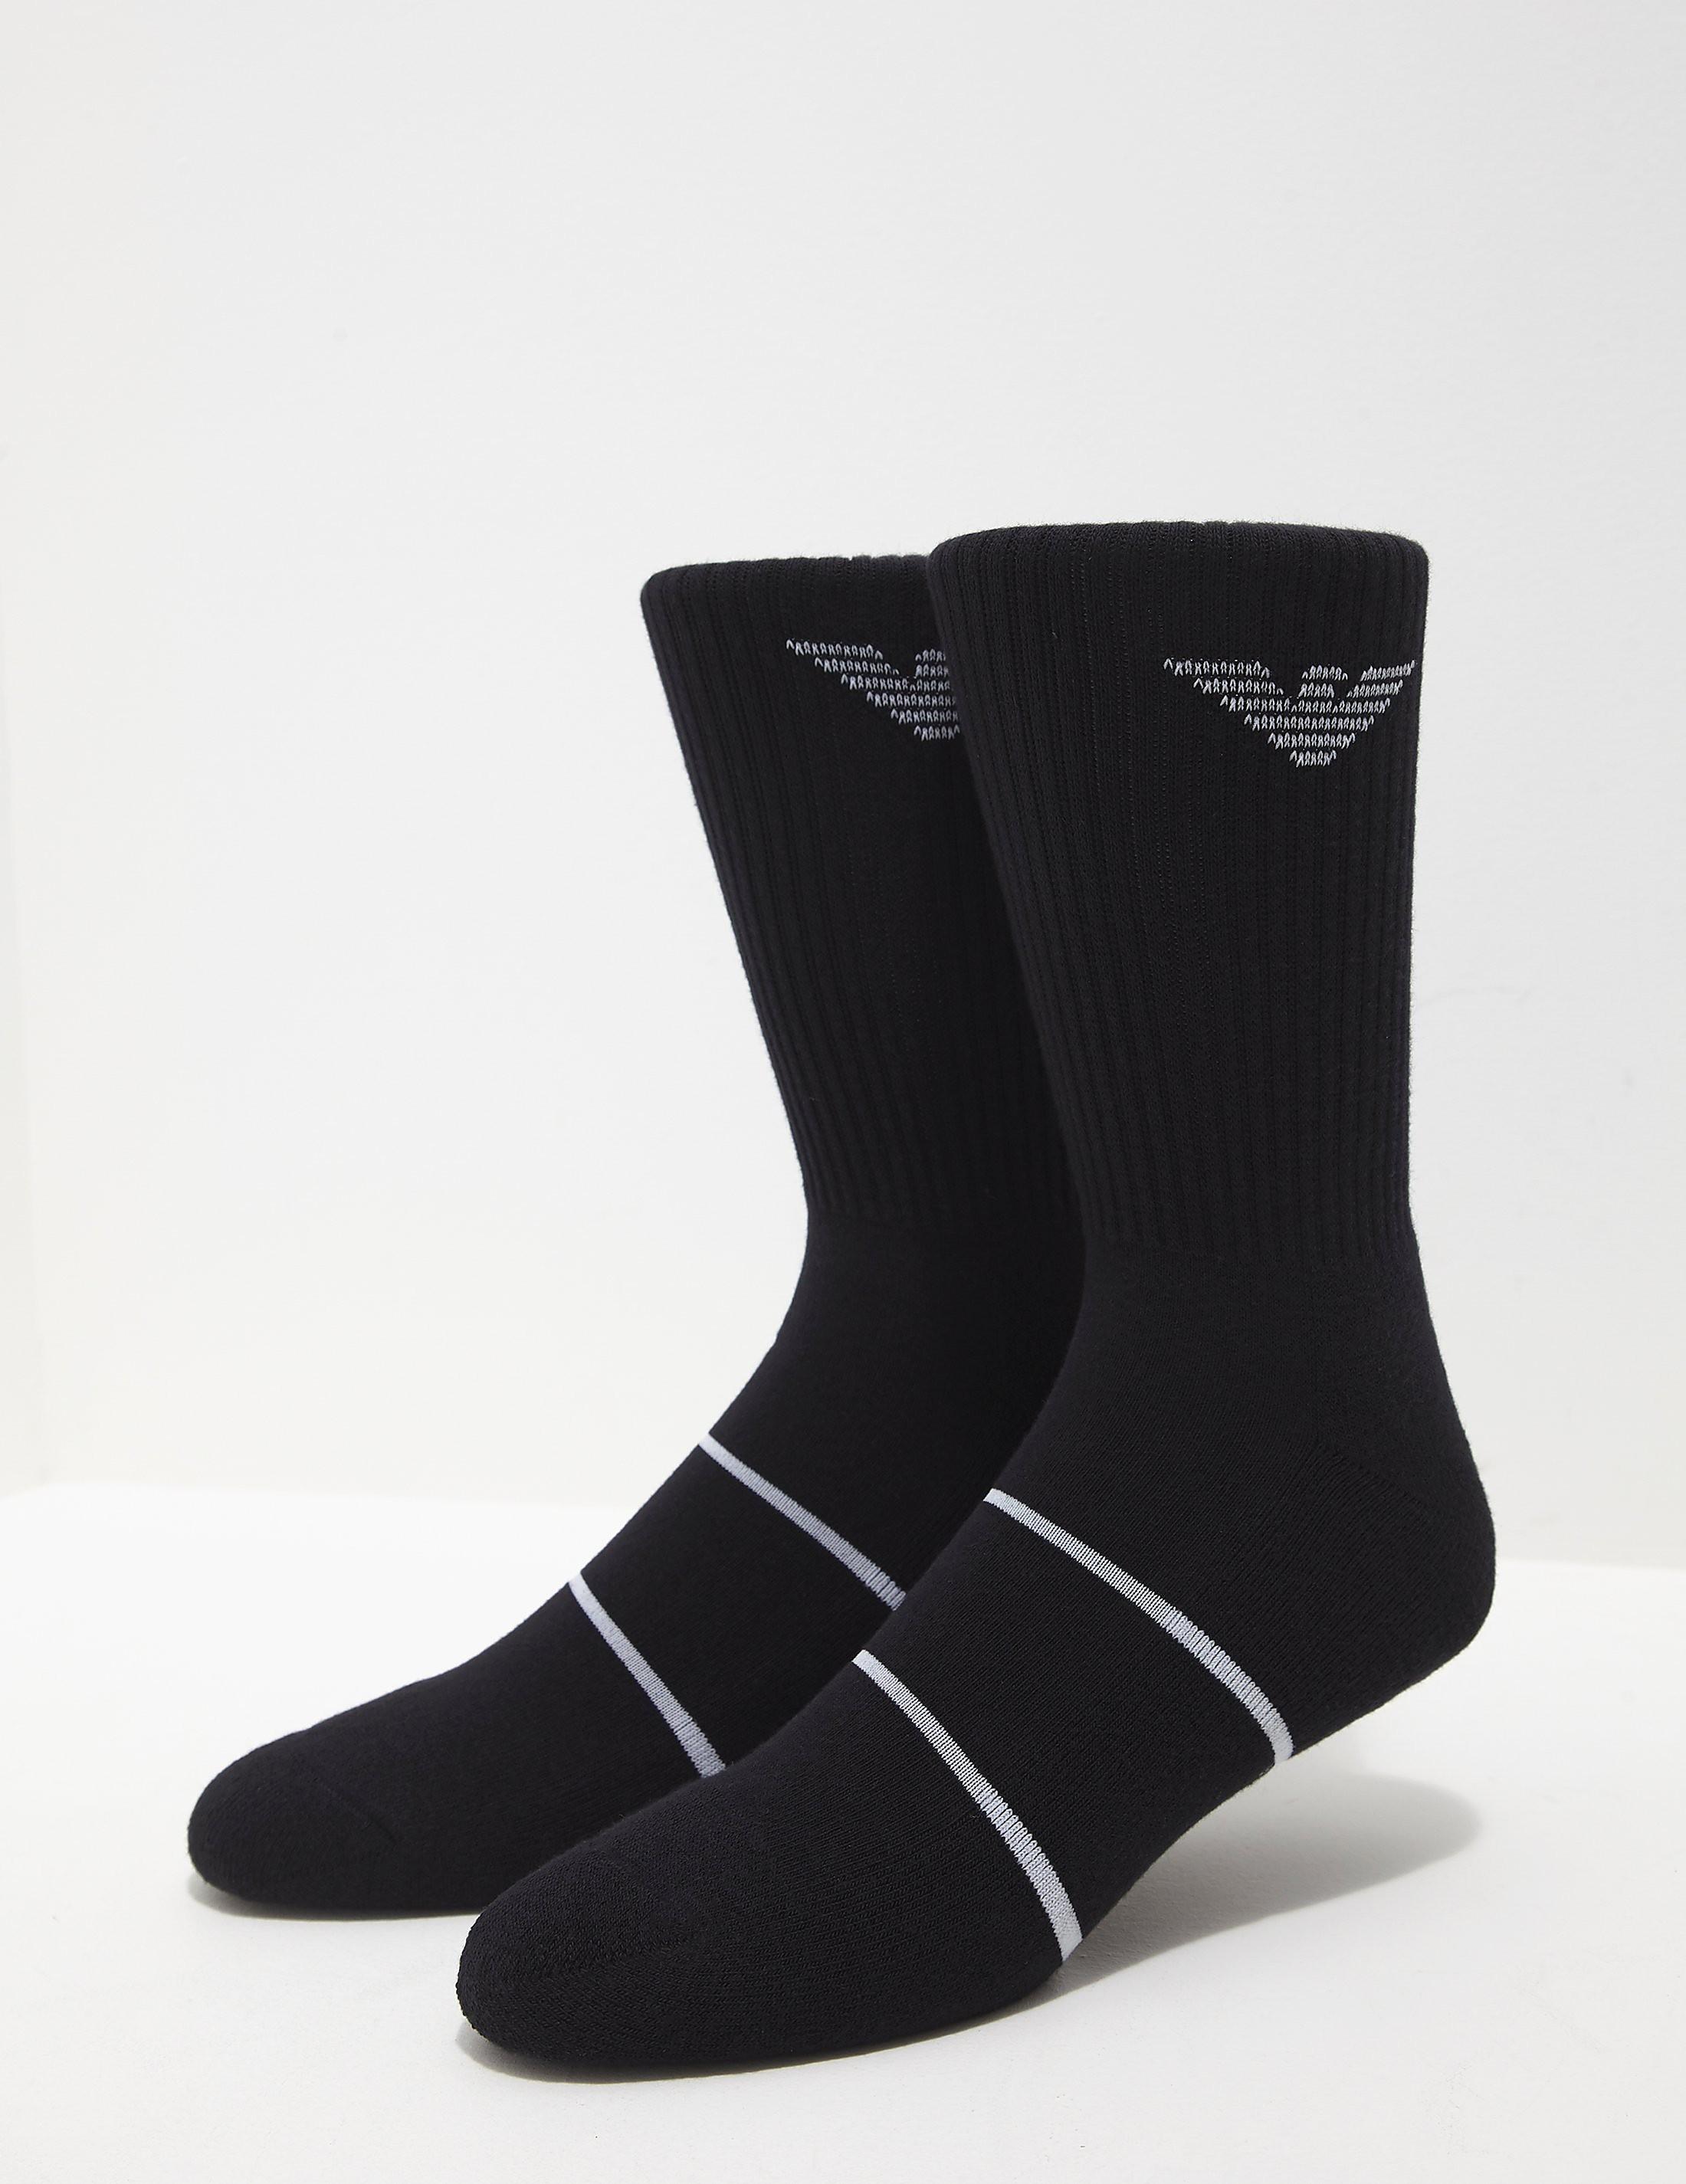 Emporio Armani 2-Pack Sports Socks